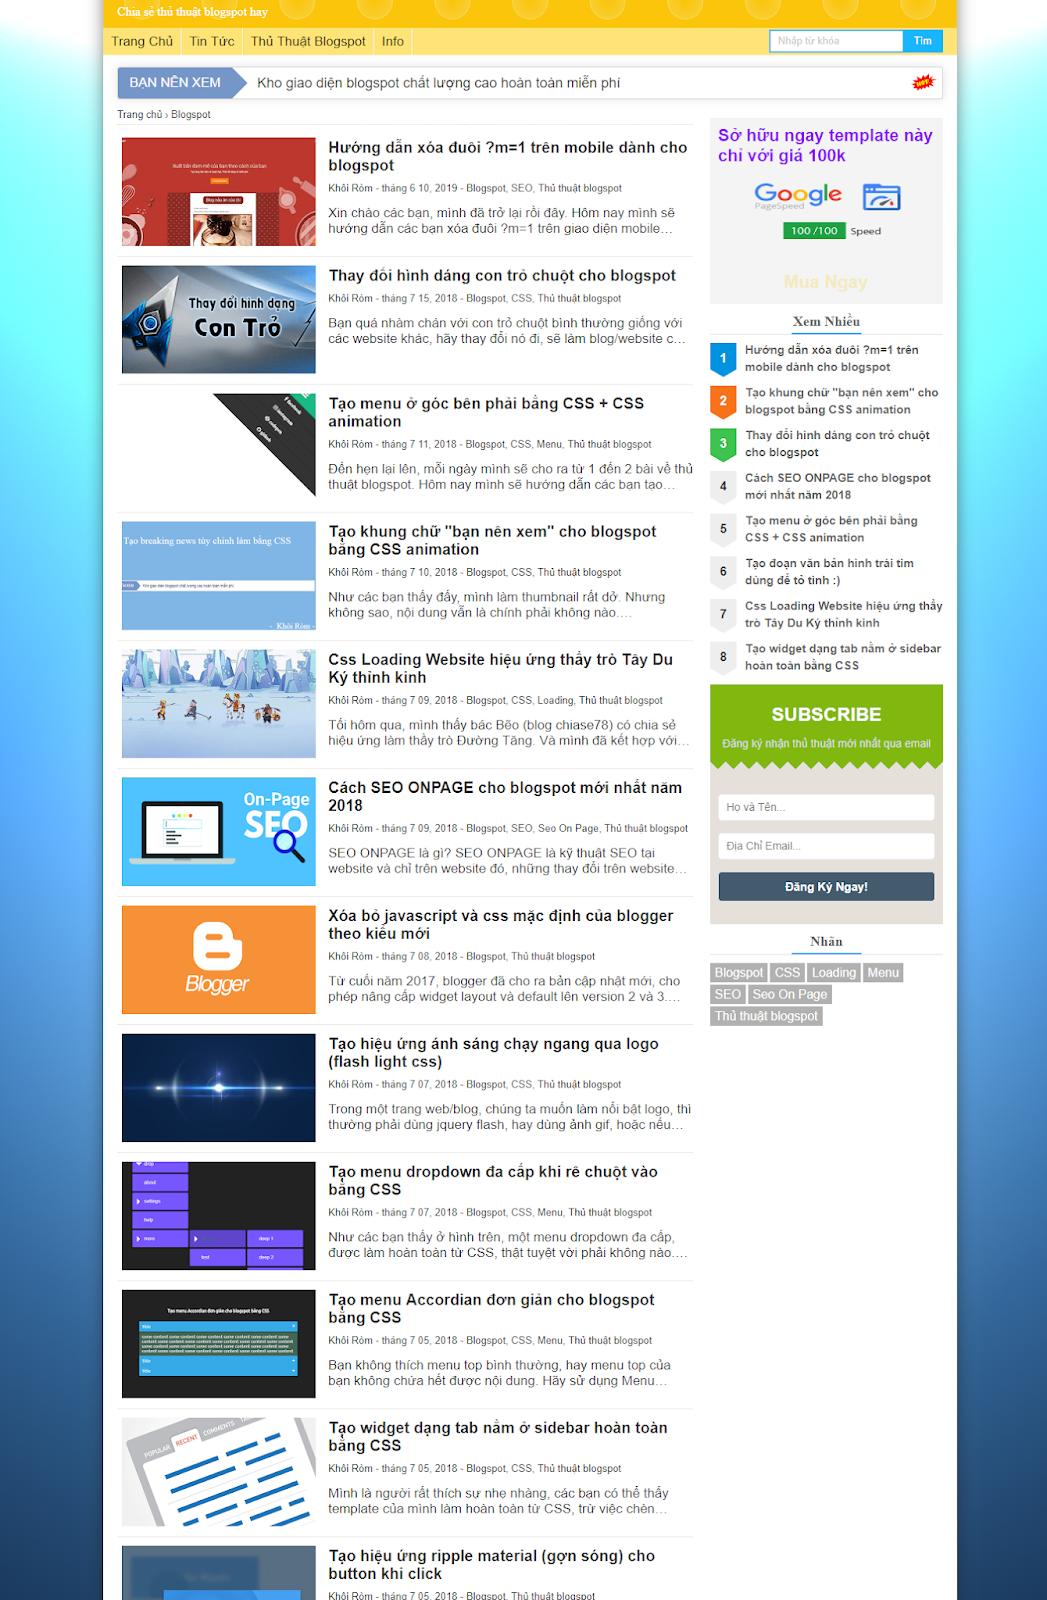 Template Blogspot Super Fast Load Template Ver 2 - Ảnh 2